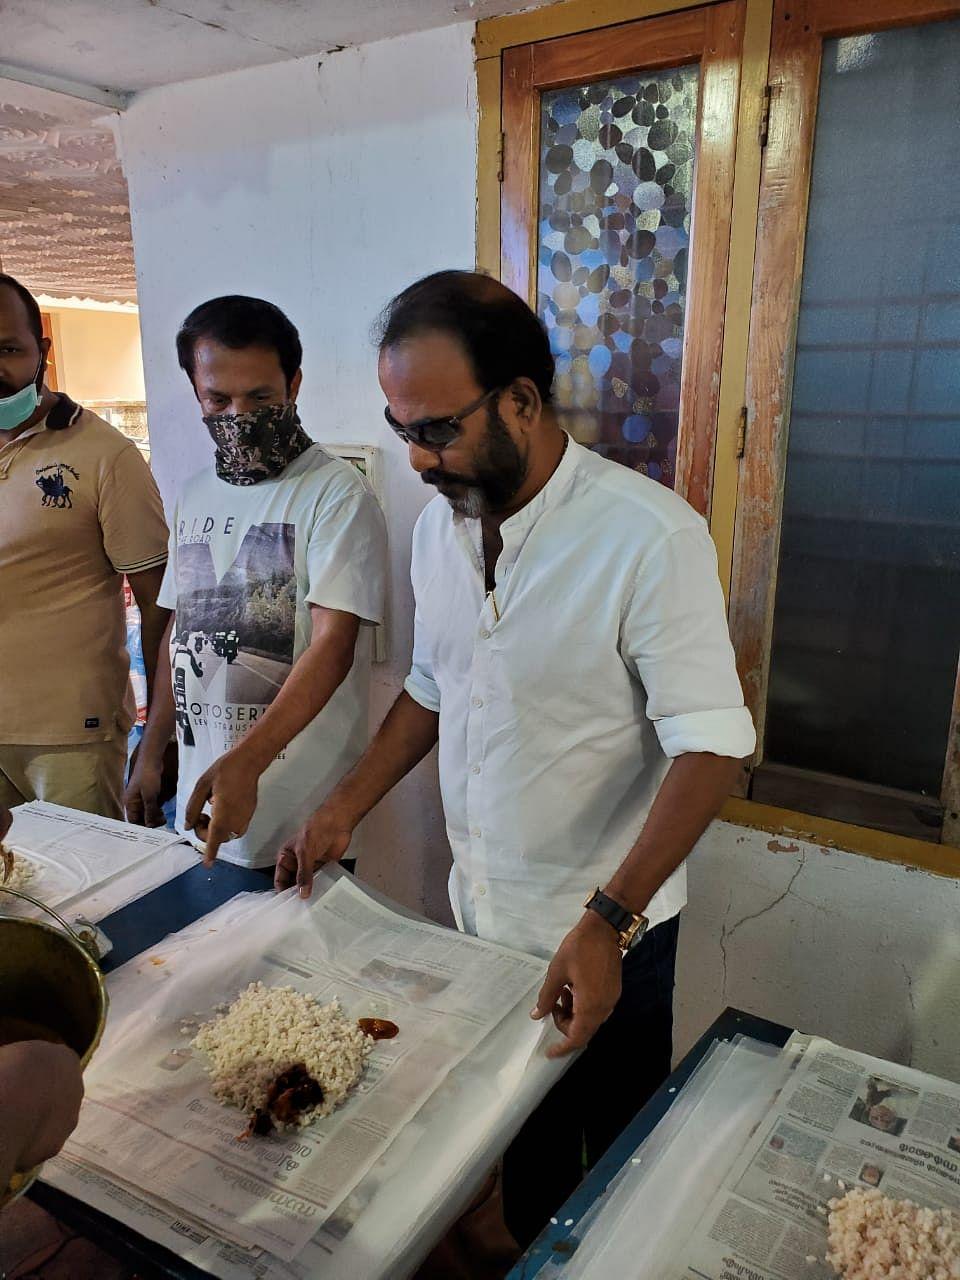 Director Major Ravi at the kitchen community run by film fraternity in Kochi